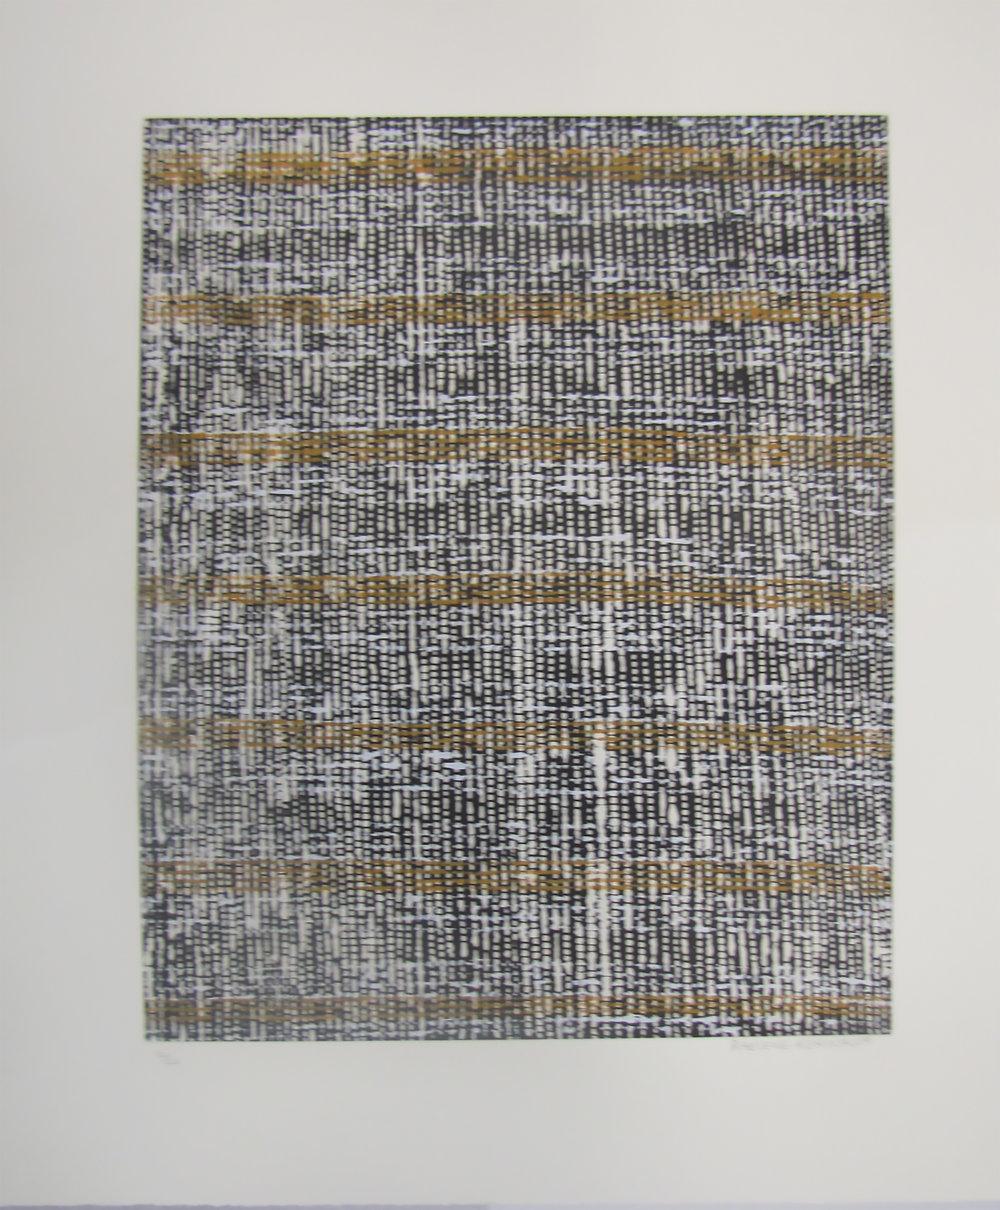 Raelene Kerinaua, Kayimwagakimi Jilamara. 2017   Etching and silkscreen. Ed 11/20  50 x 40.5 cm. $480 unframed   $680 framed   Editions 12/20 and 13/20 (unframed) also available